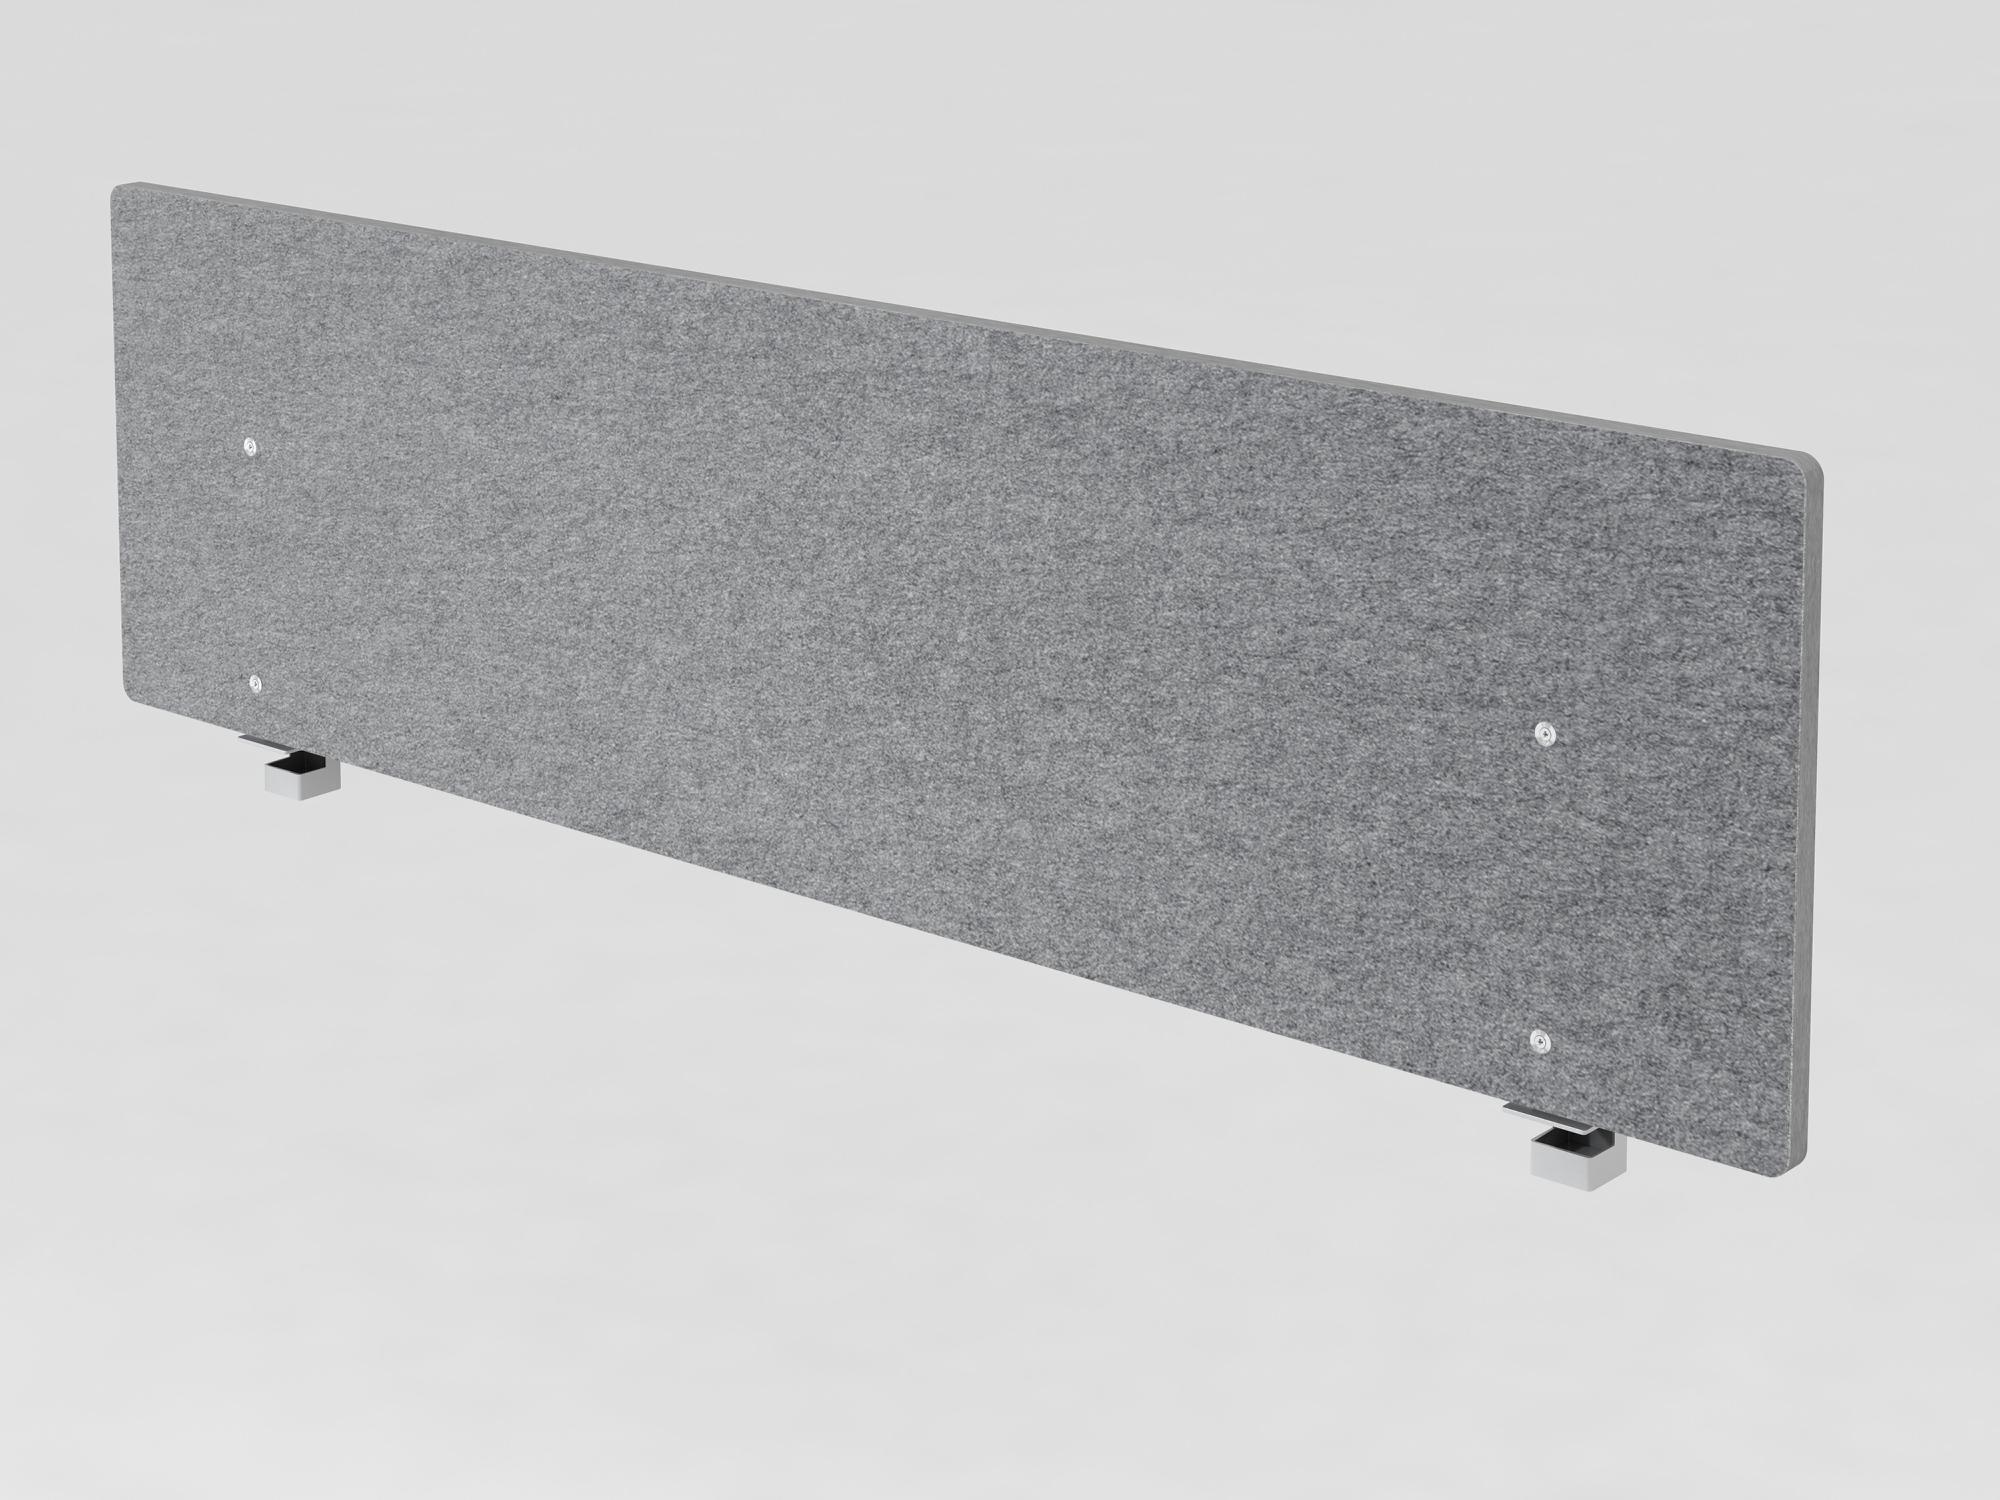 Akustik-Trennwand 180cm, grau-meliert